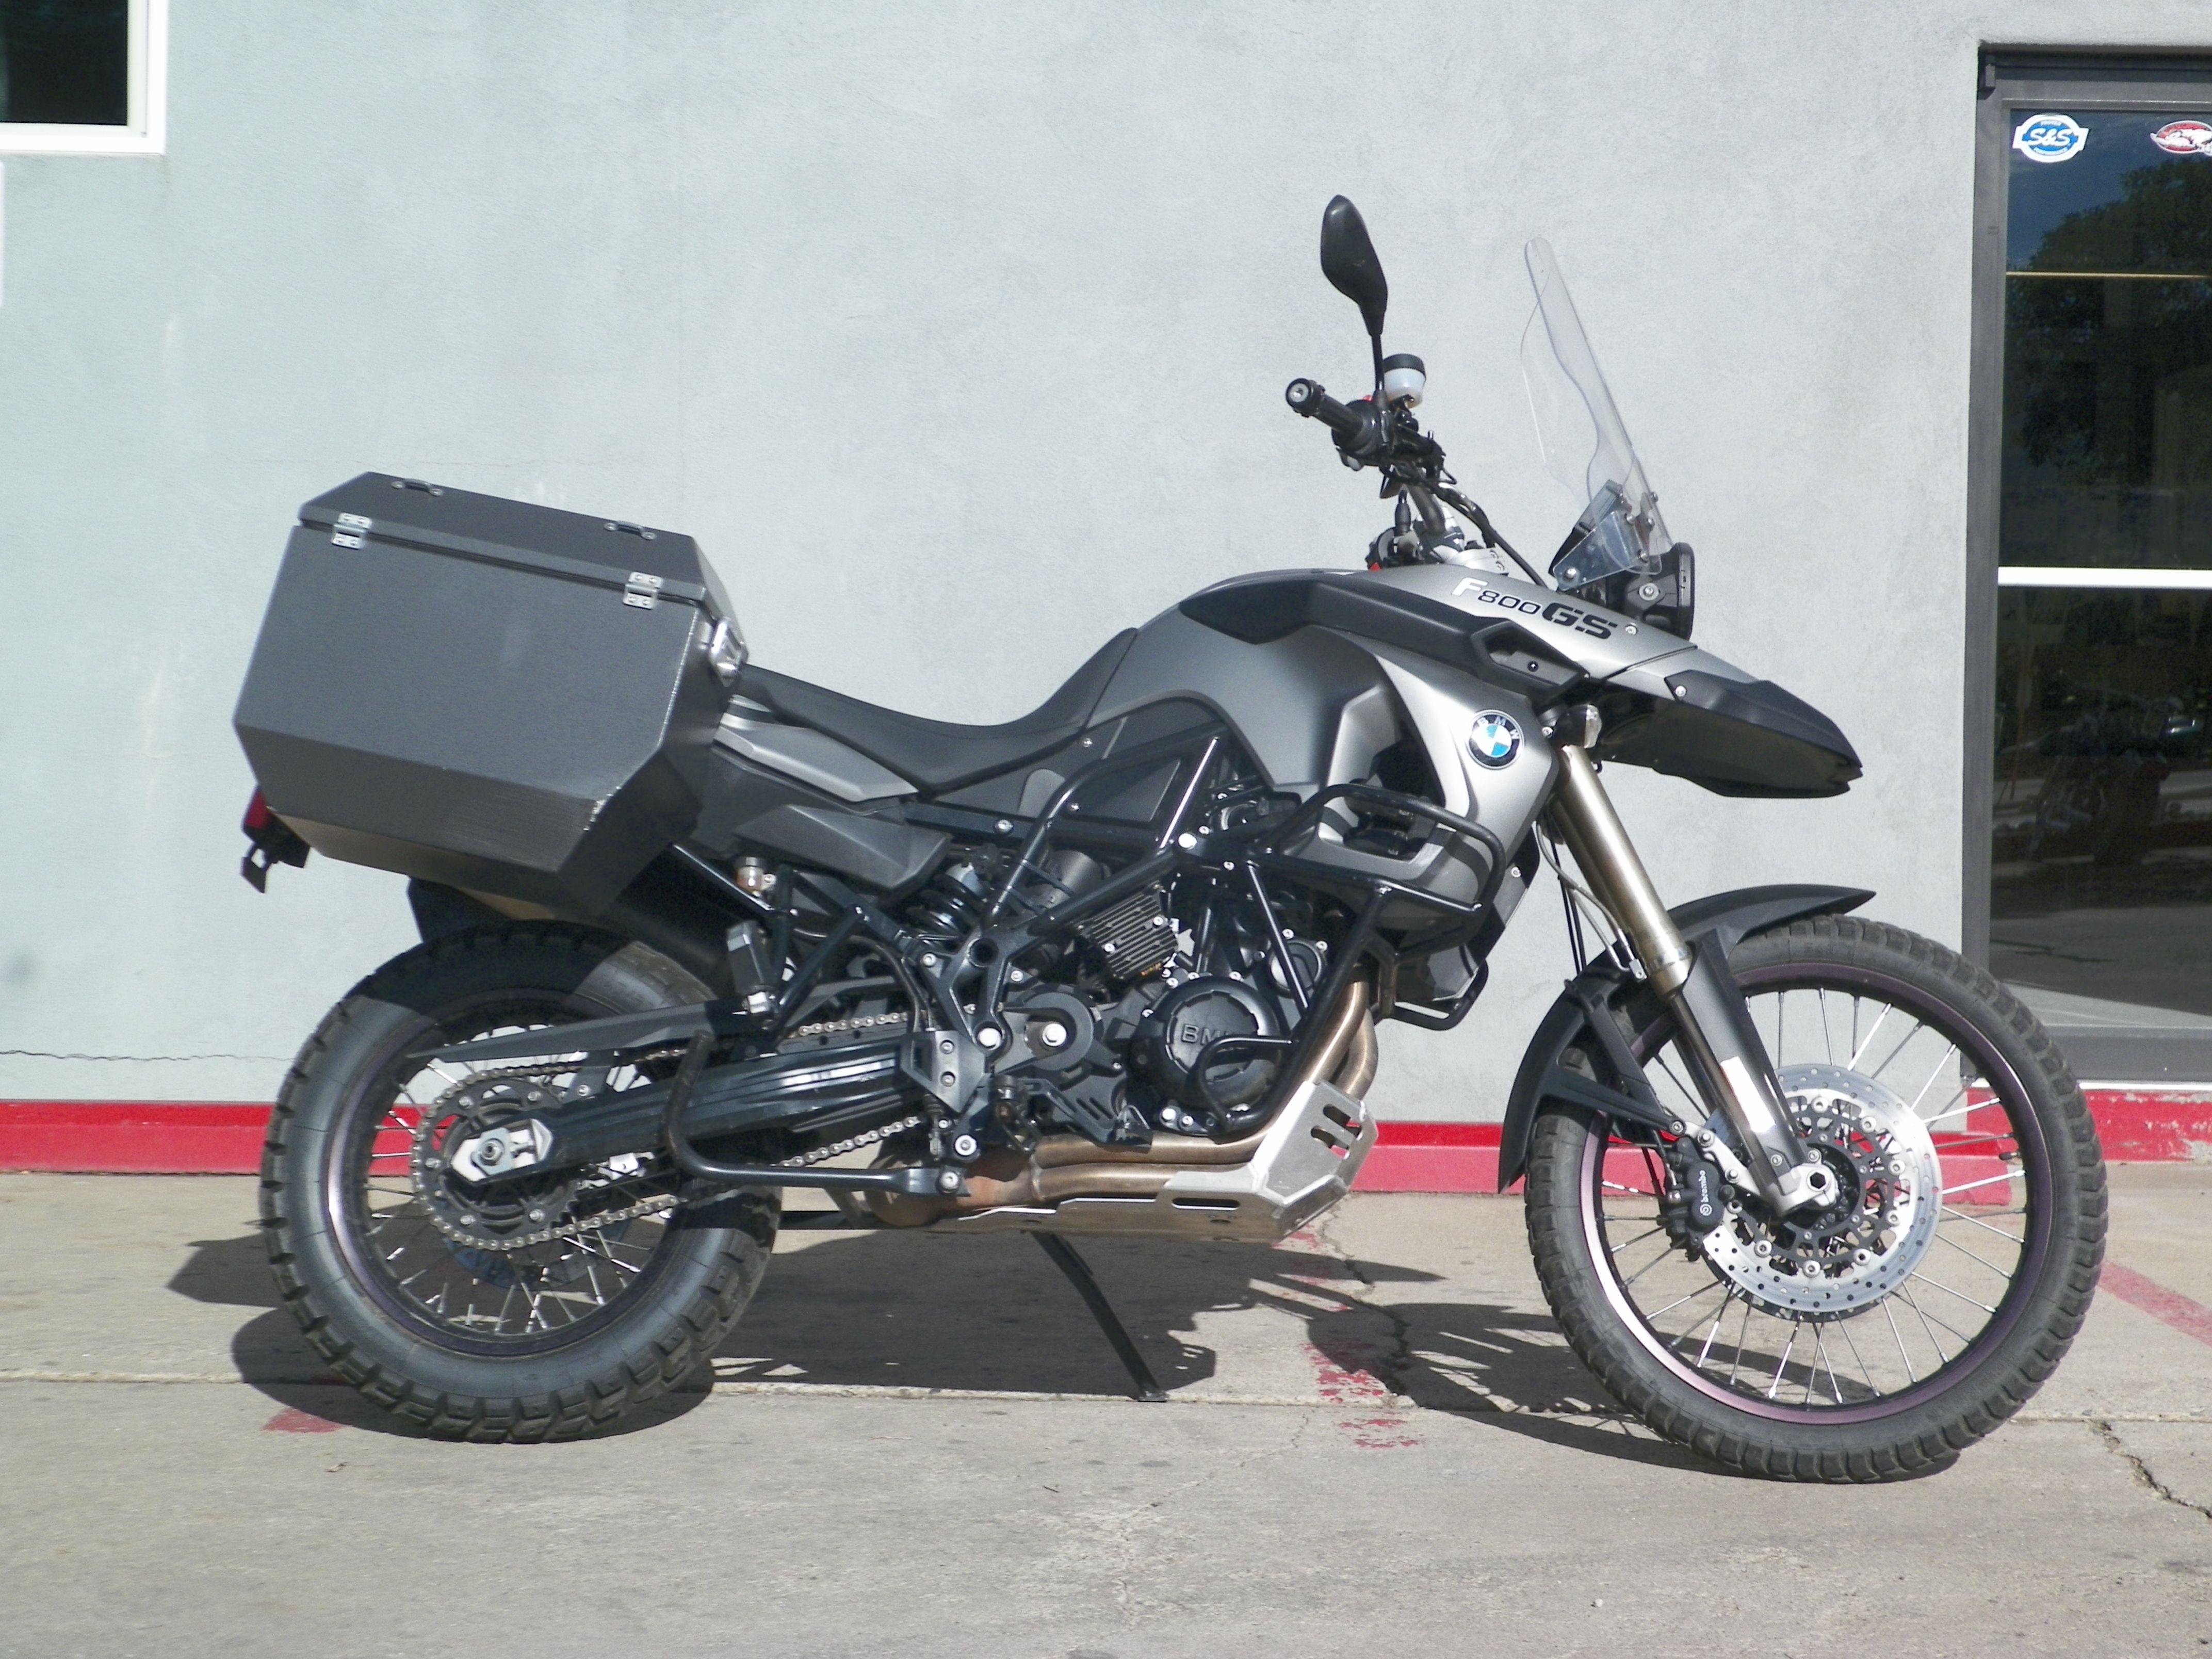 Sold 2009 Bmw F800gs